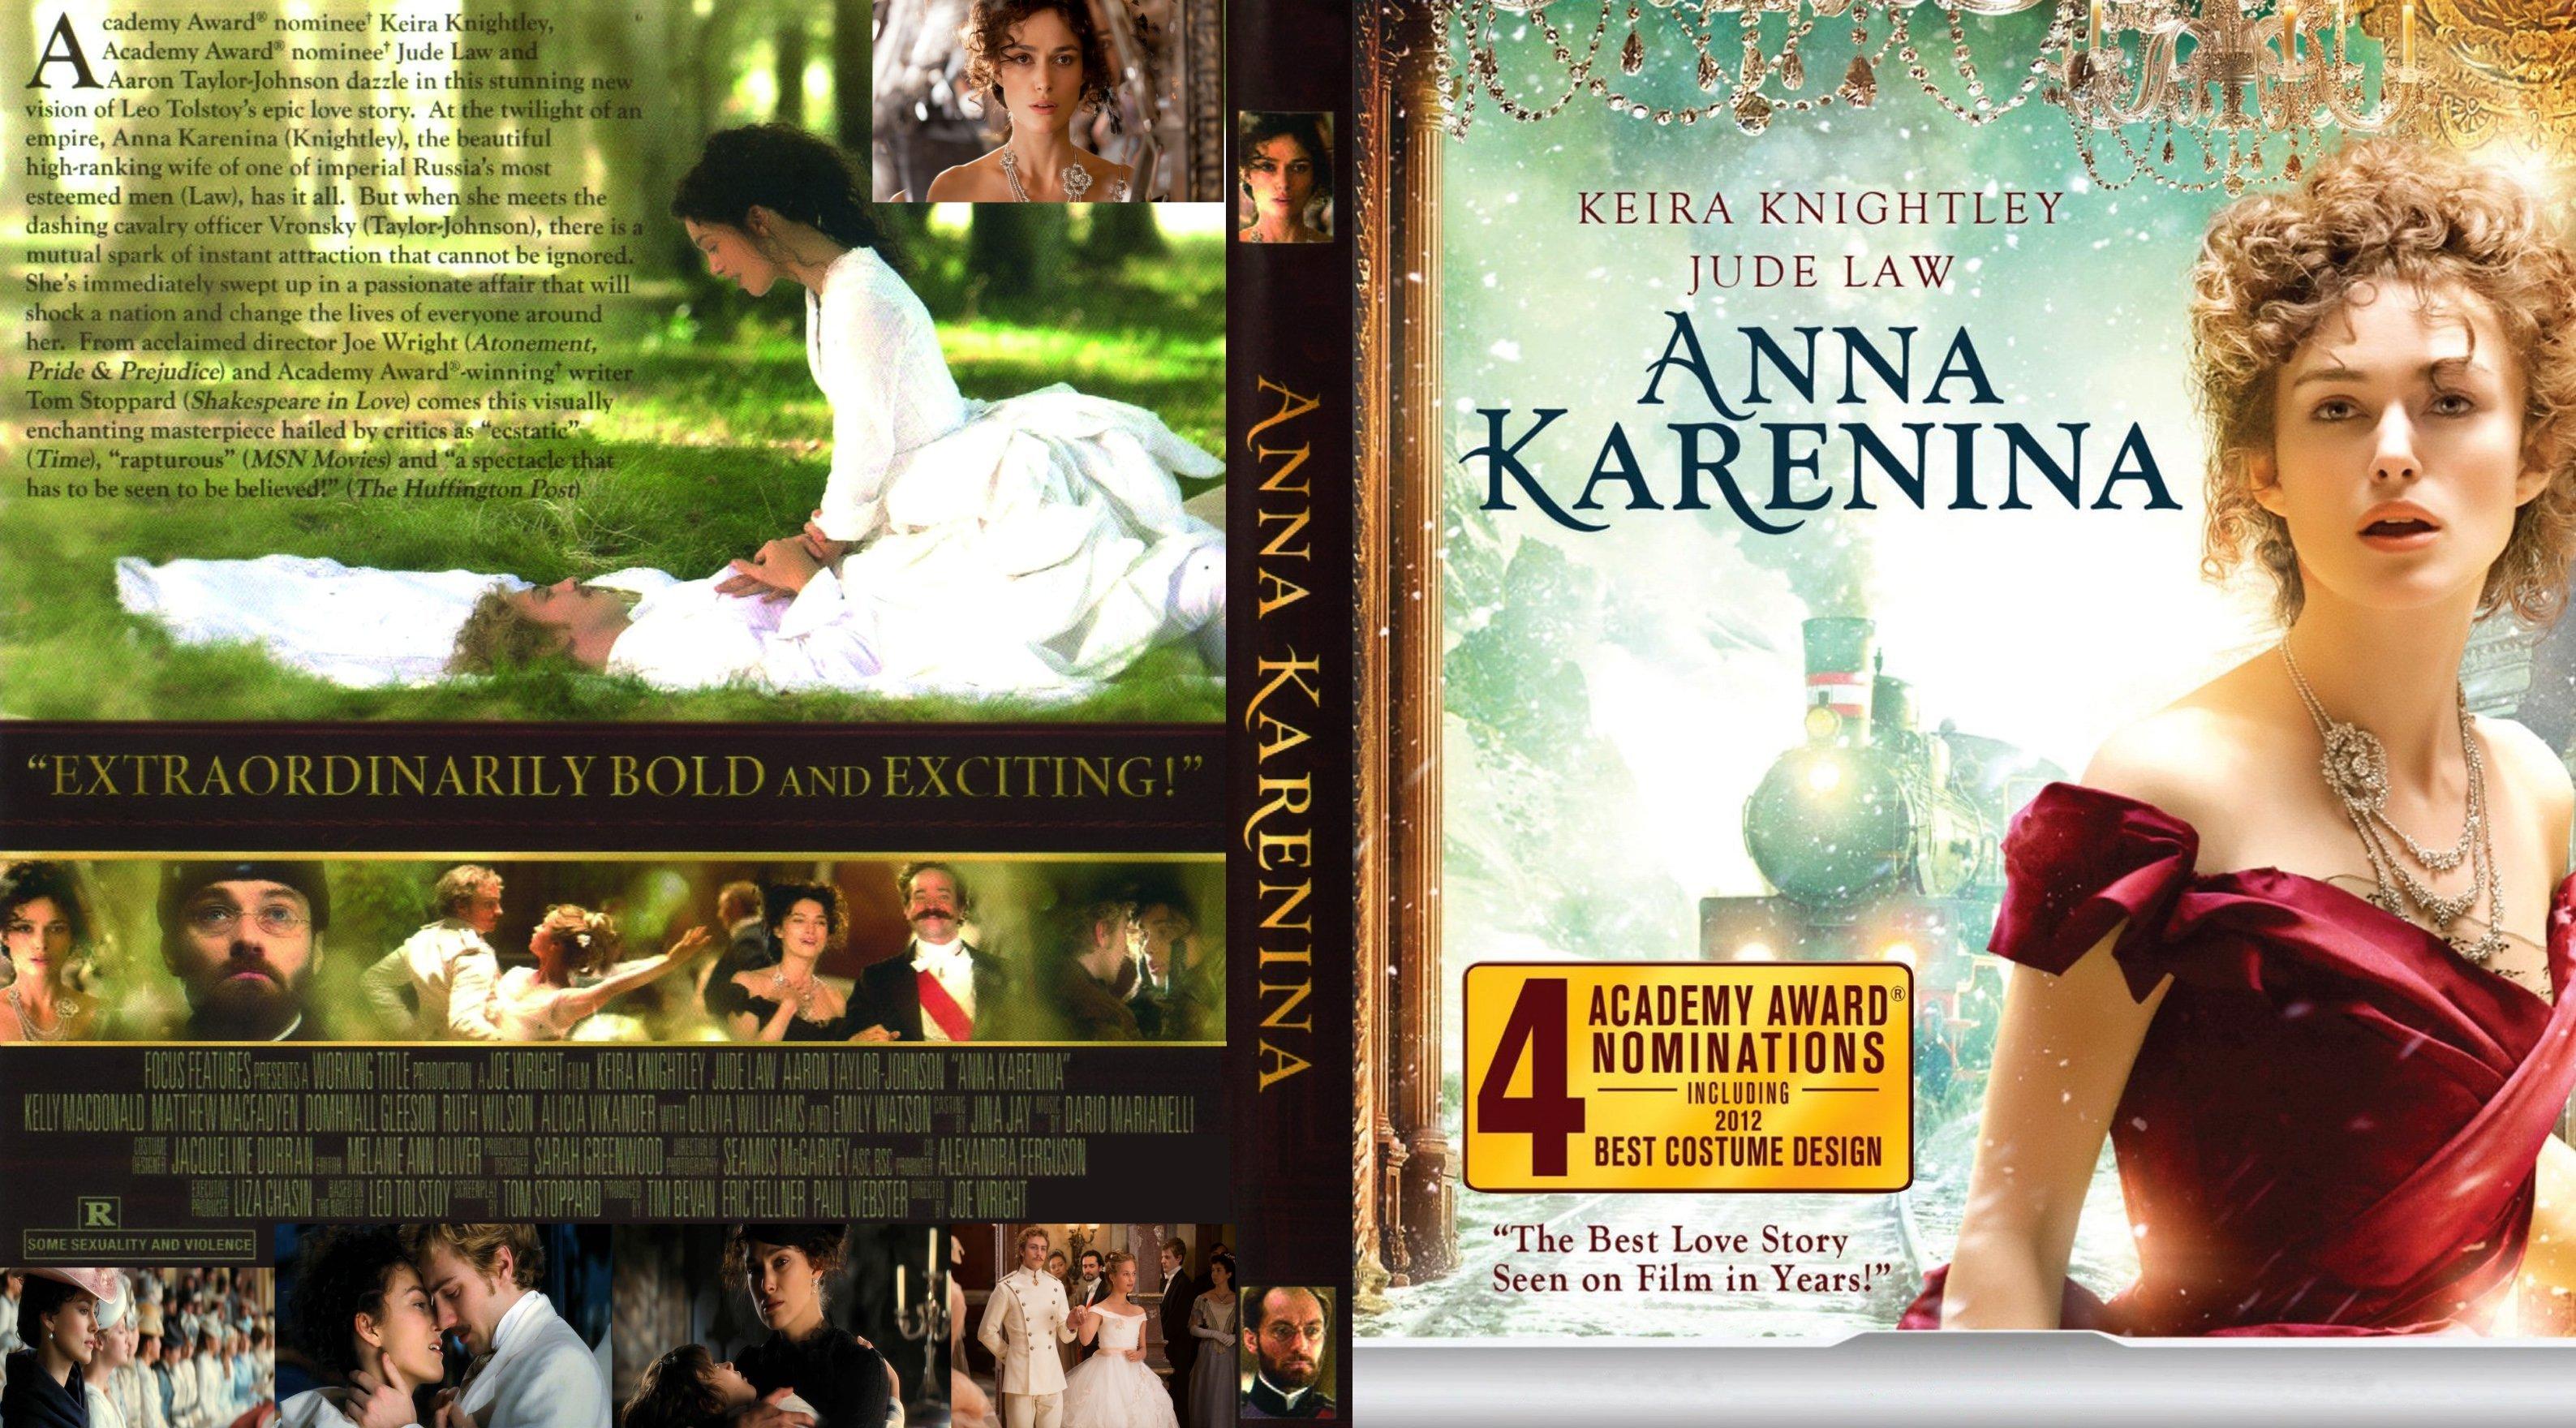 Anna Karenina Cover Anna karenina 2012 dvd cover